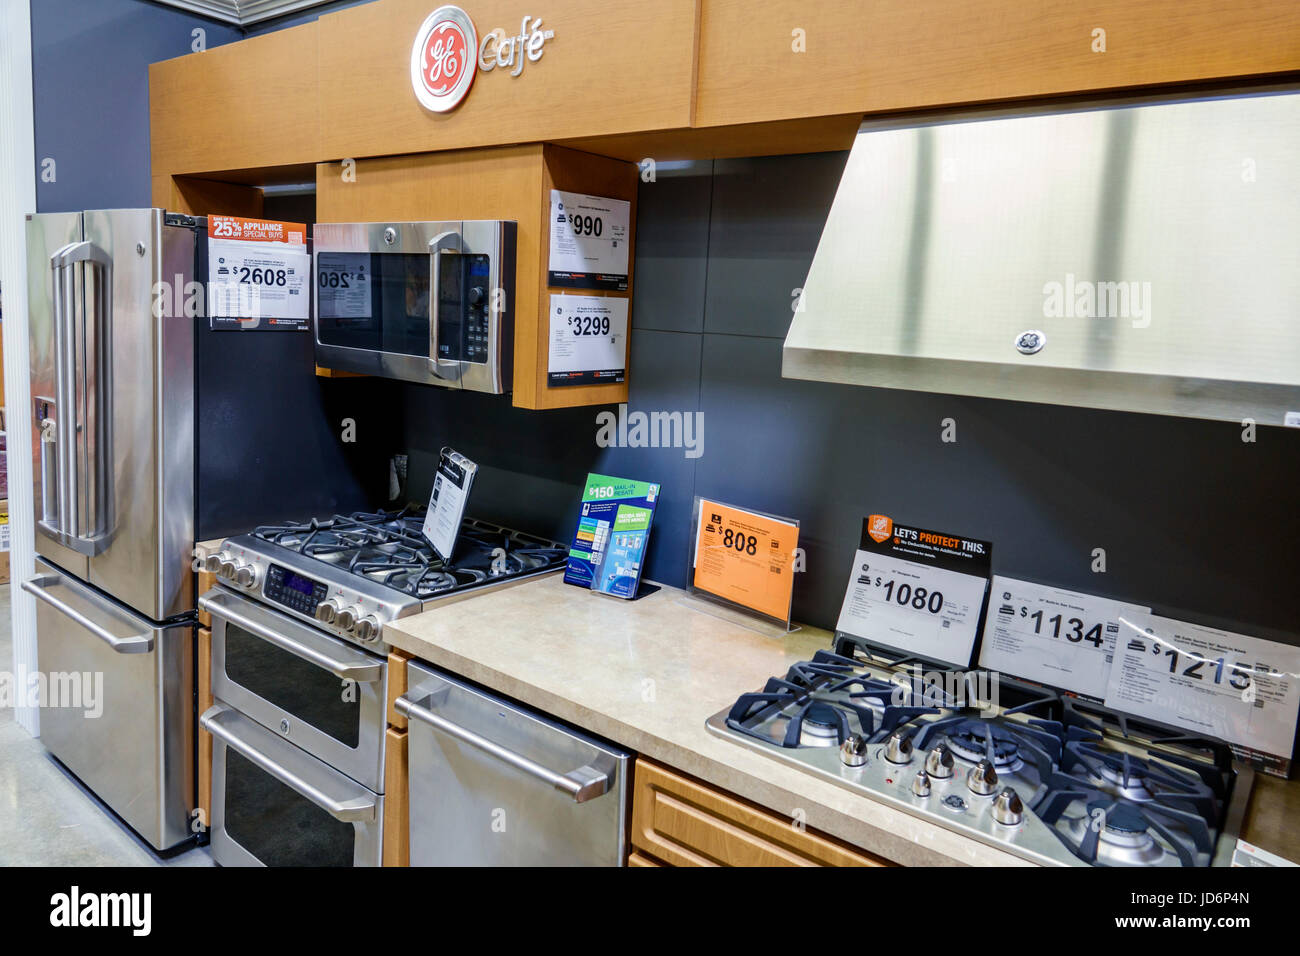 Interior General Store Shop In Stockfotos & Interior General Store ...